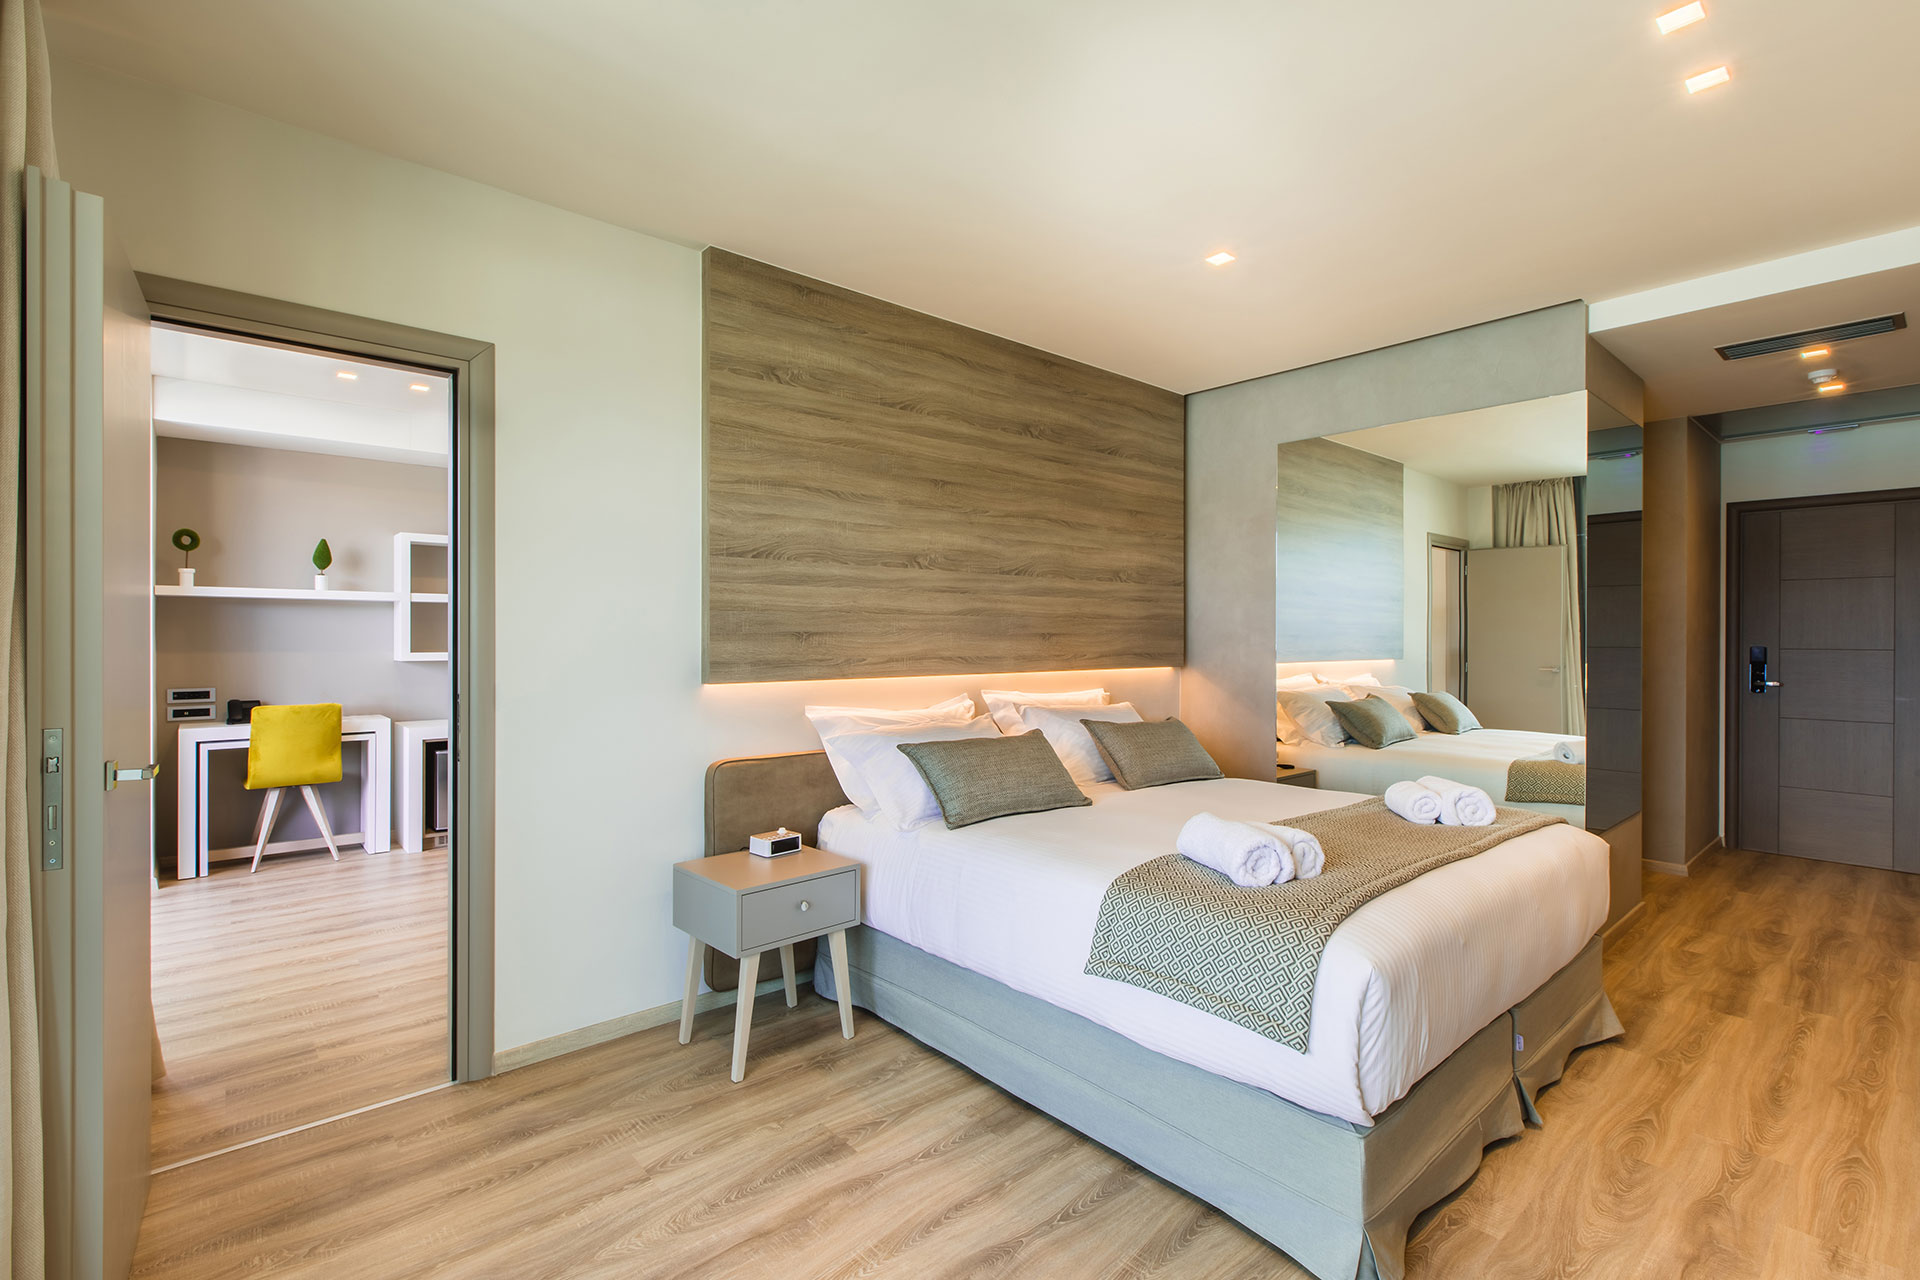 Oniros Room